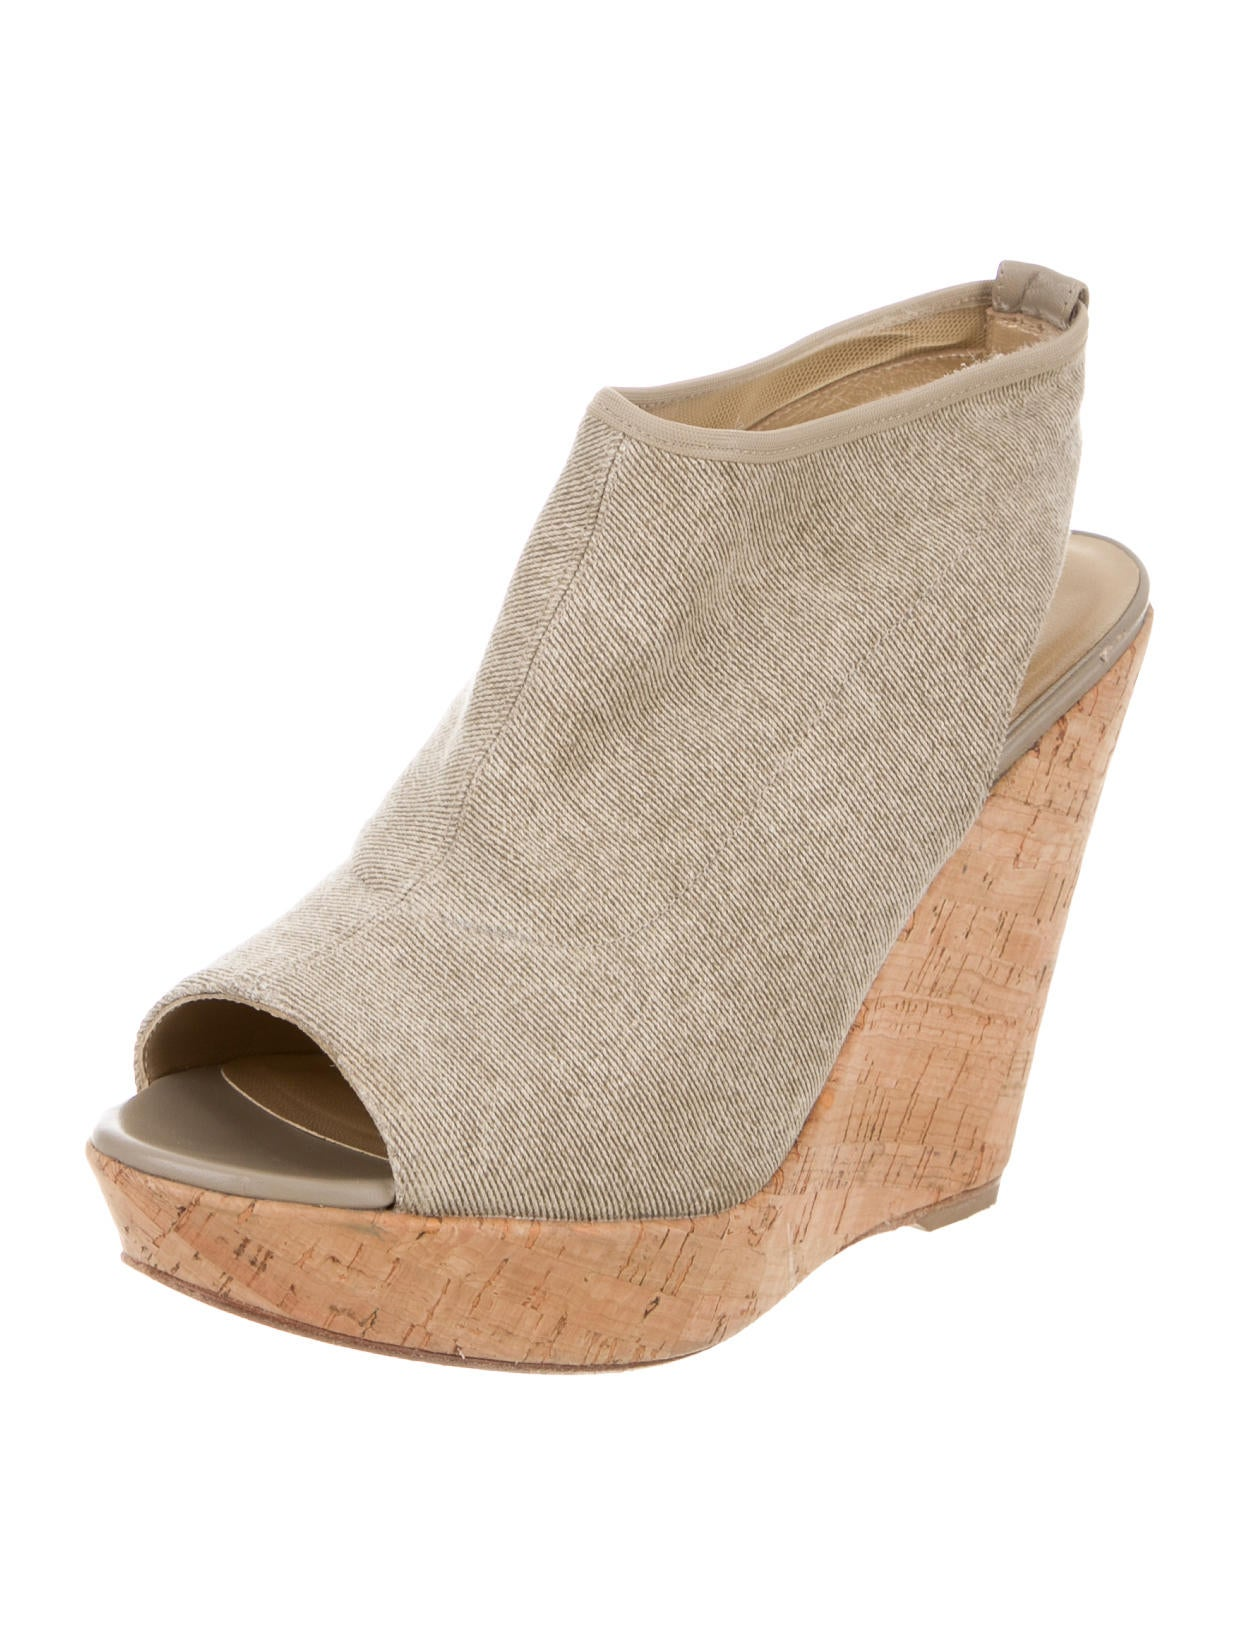 stuart weitzman canvas wedge sandals shoes wsu27599